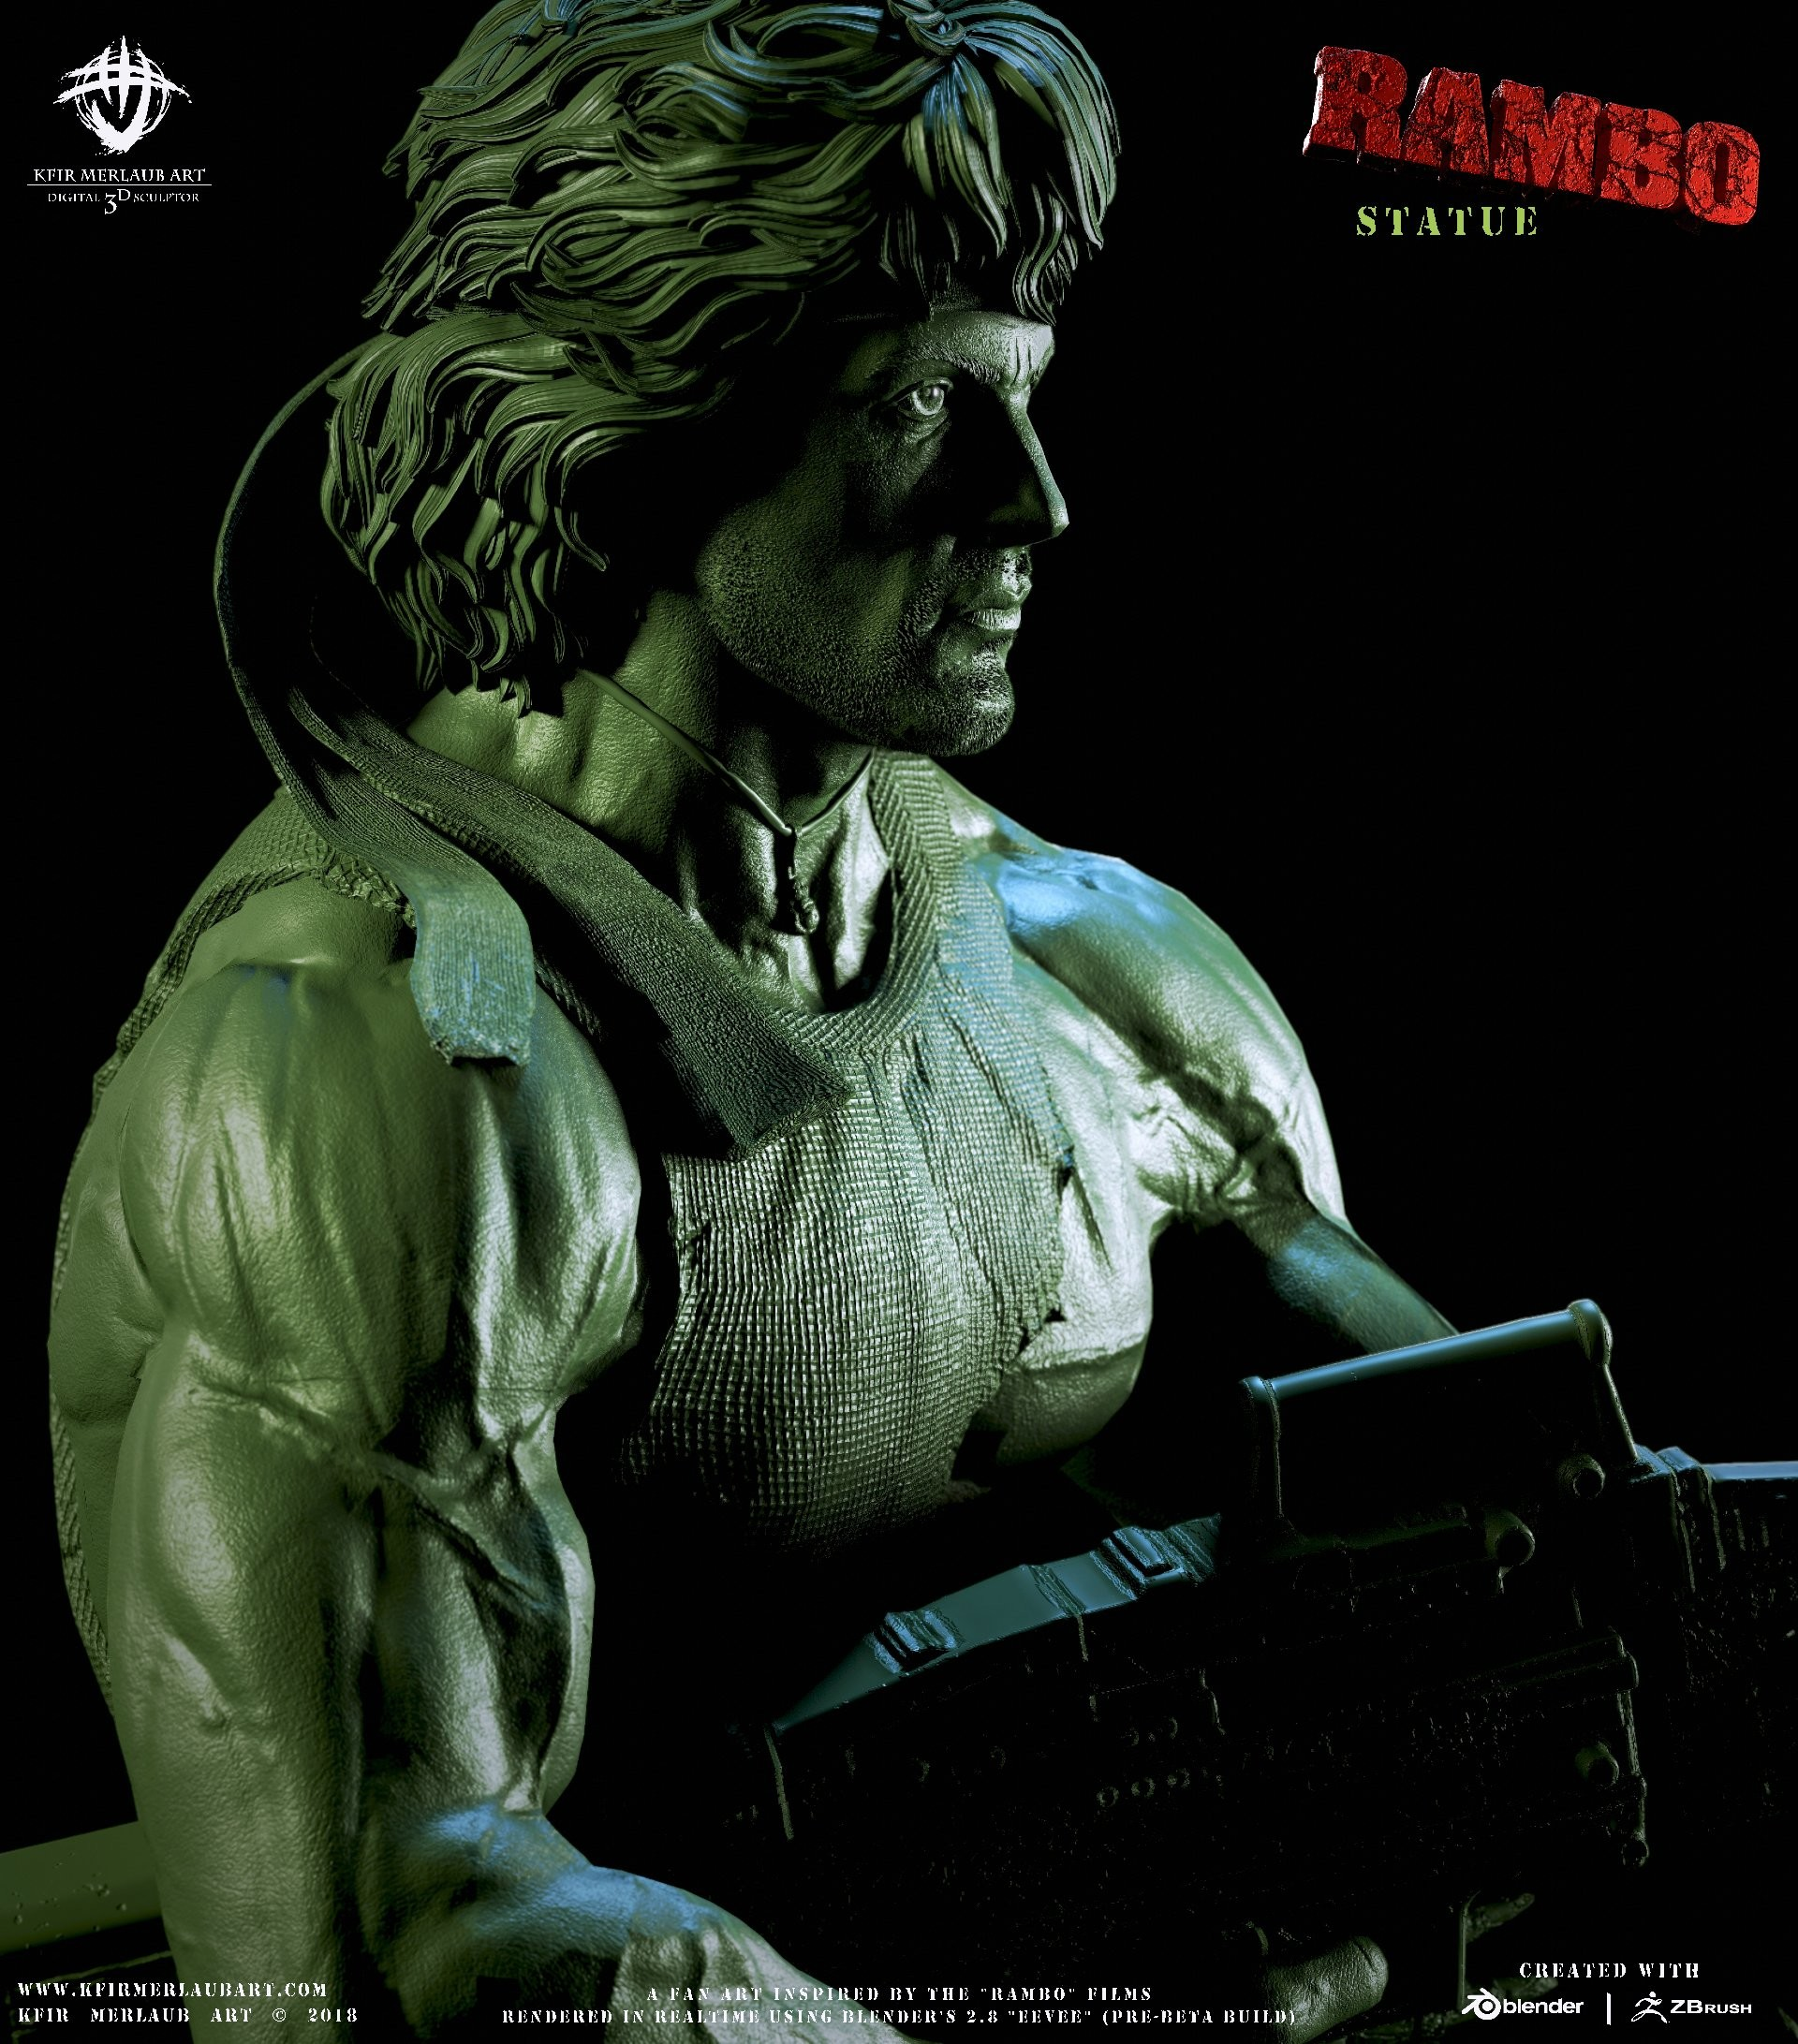 ArtStation - Rambo Statue | Kfir Merlaub Art, Kfir Merlaub